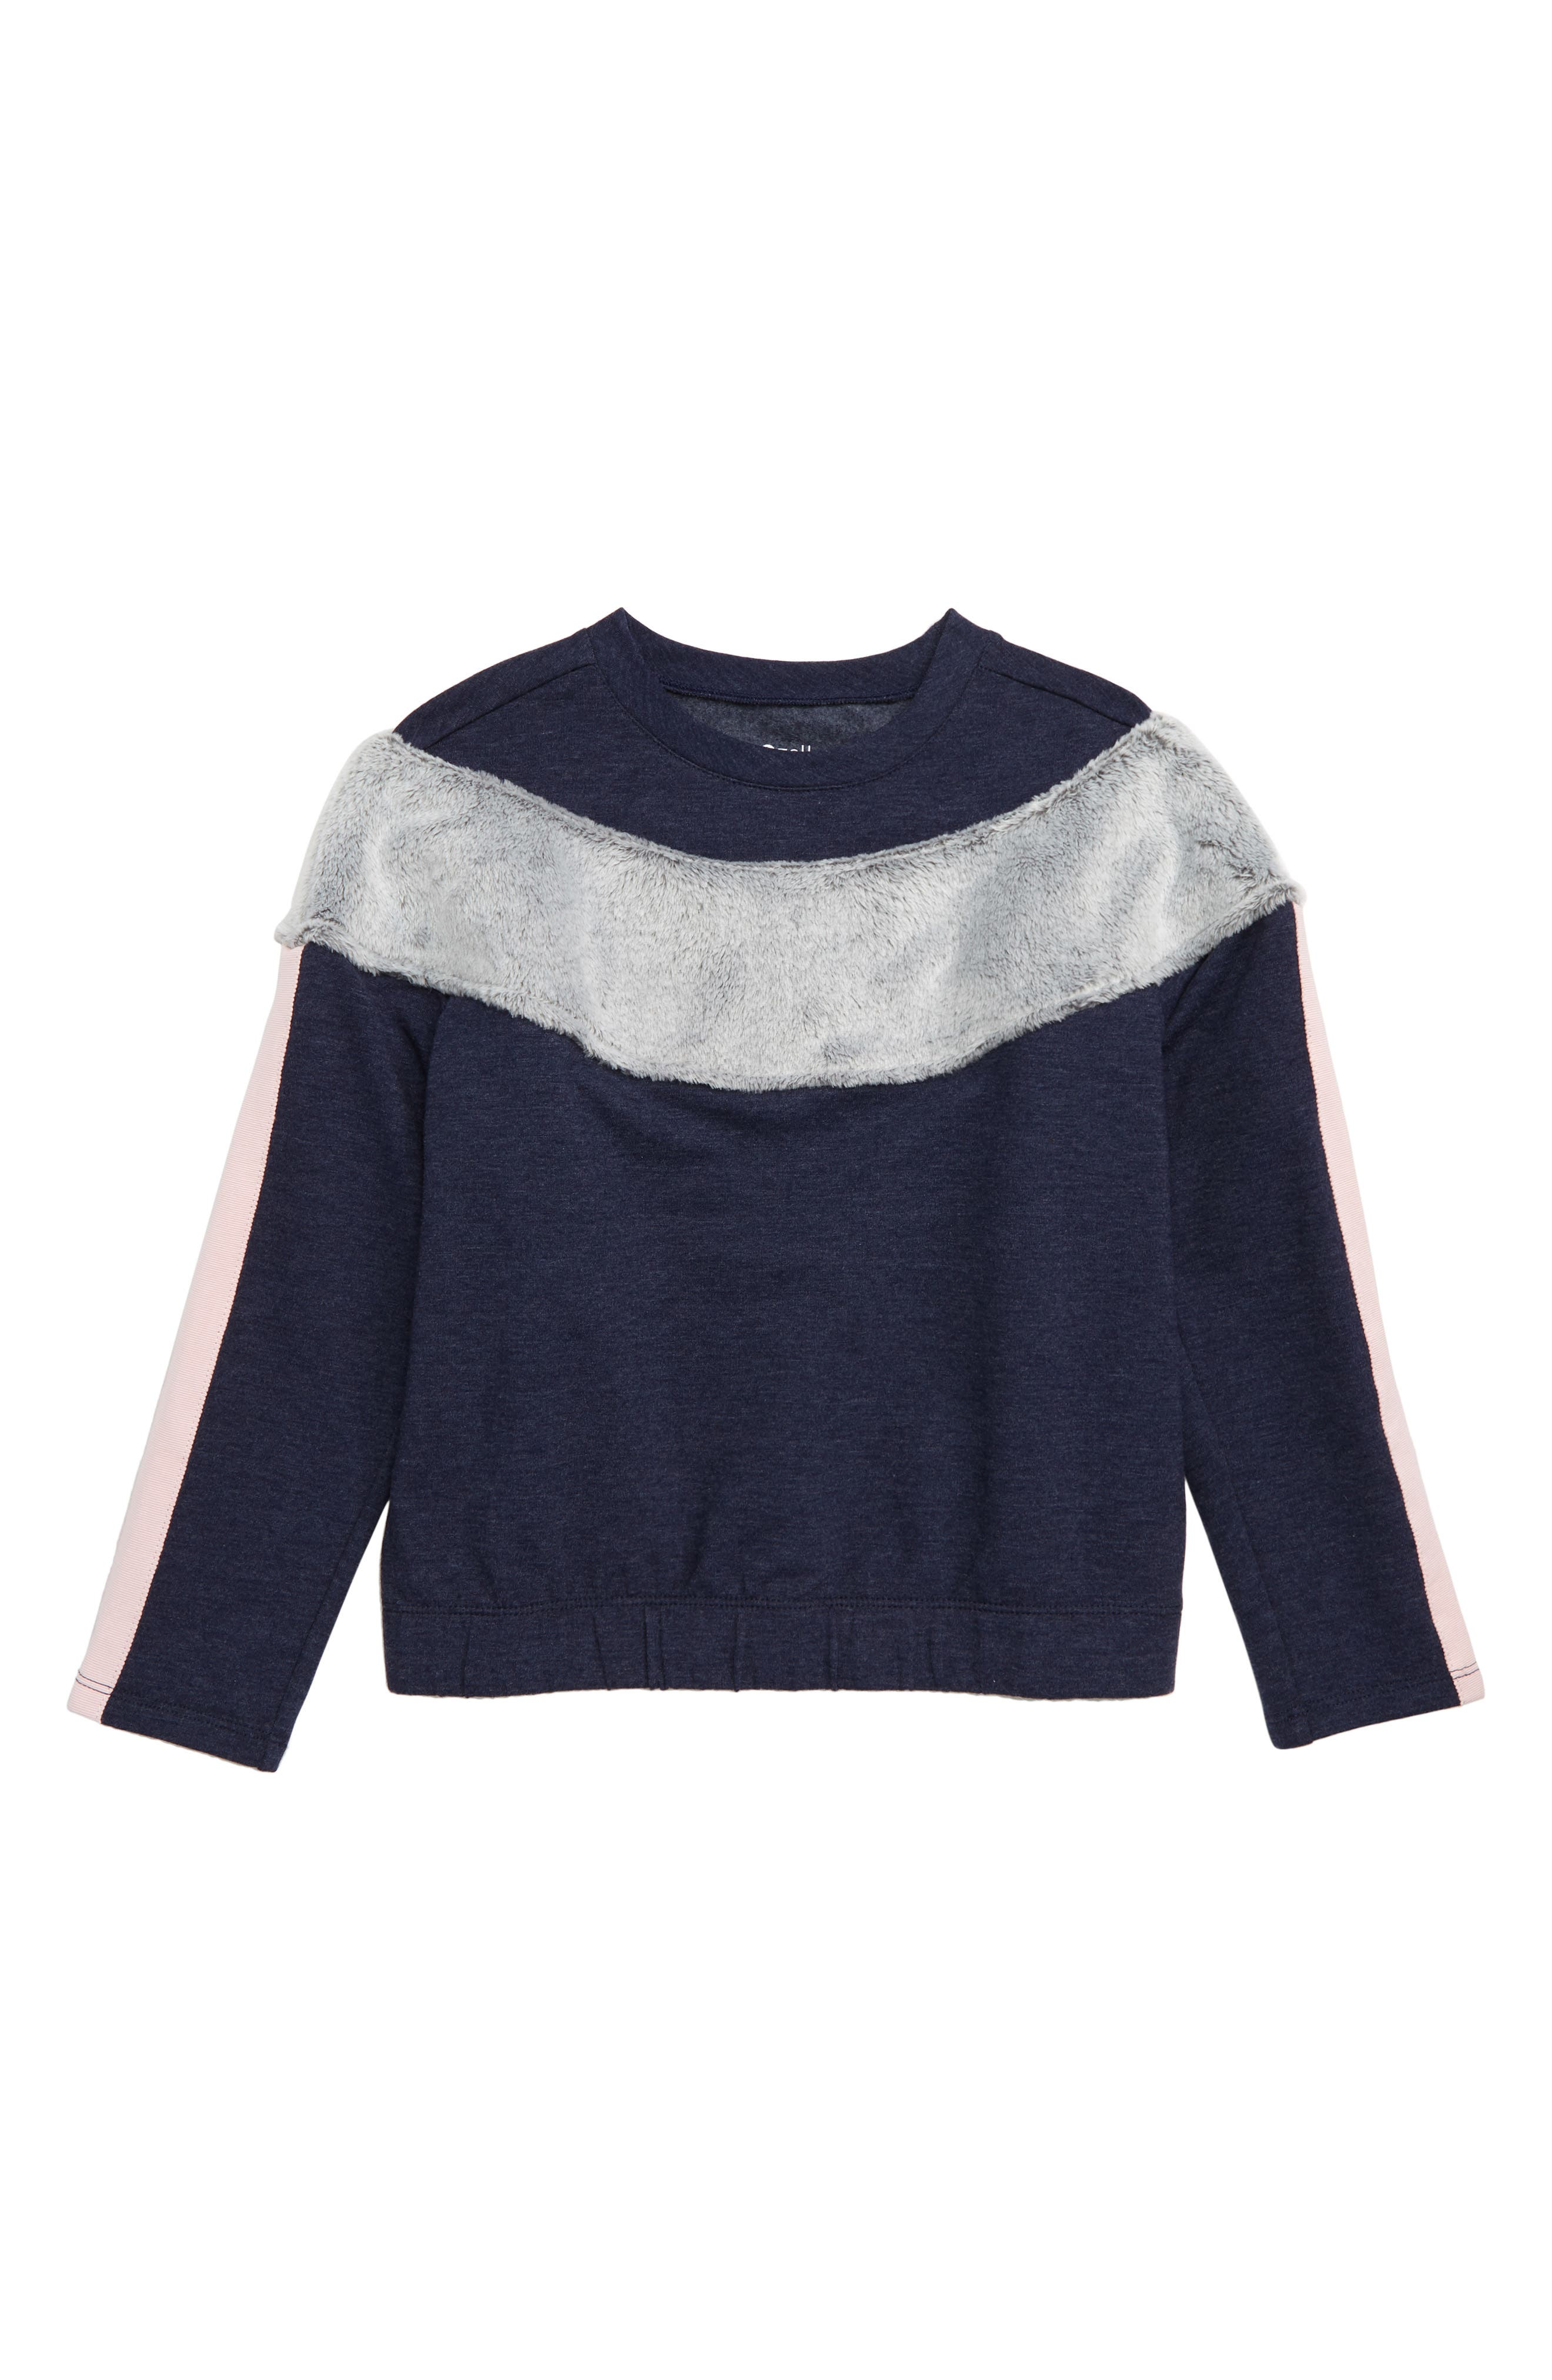 ZELLA GIRL Sporty Stripe Fleece Sweatshirt, Main, color, 410